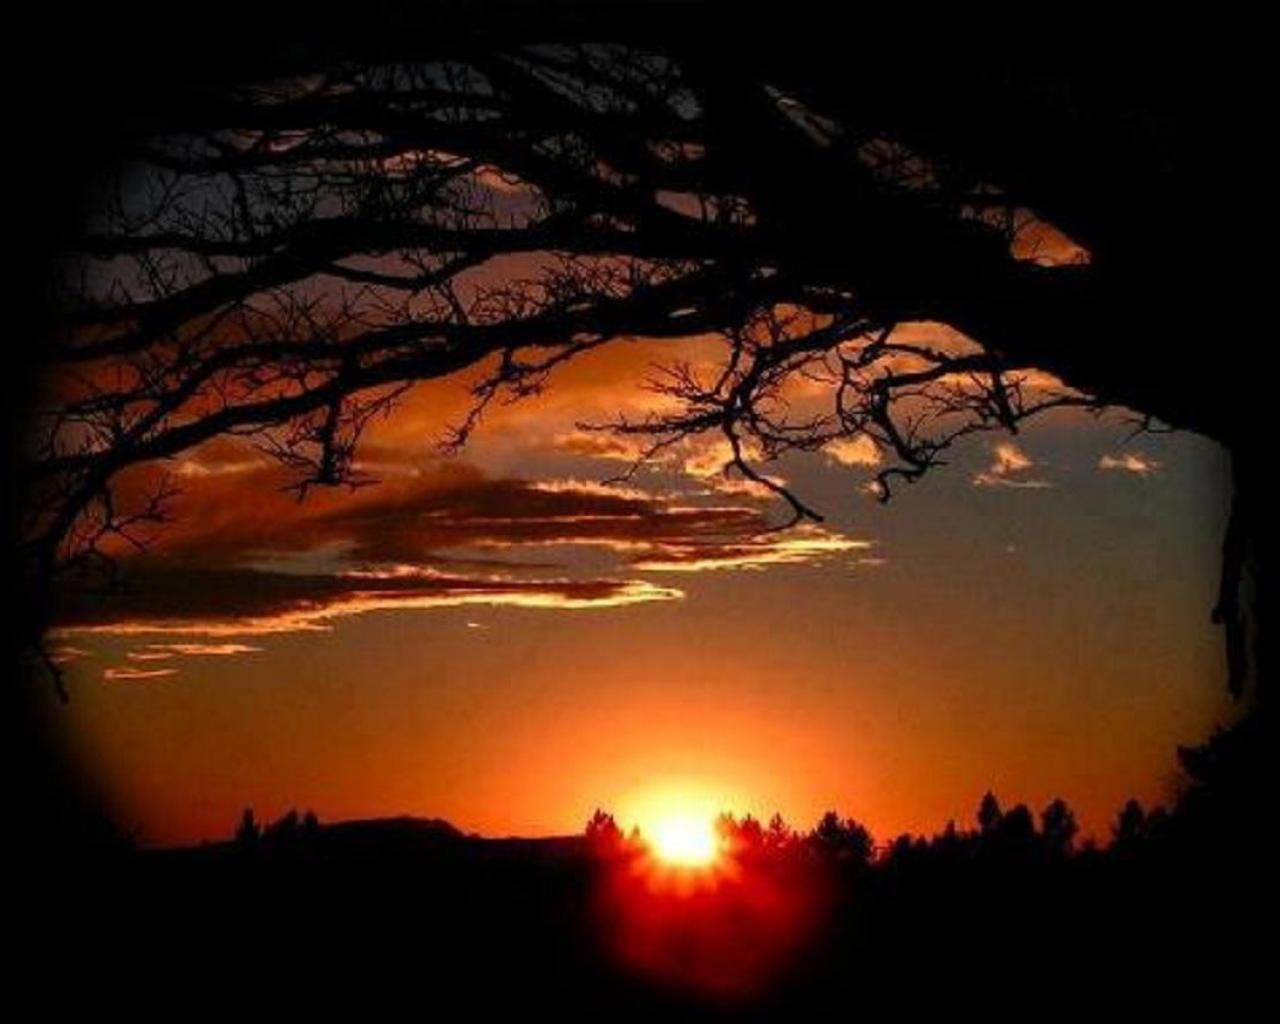 Wallpaper Tags: trees evening nature dark sunset